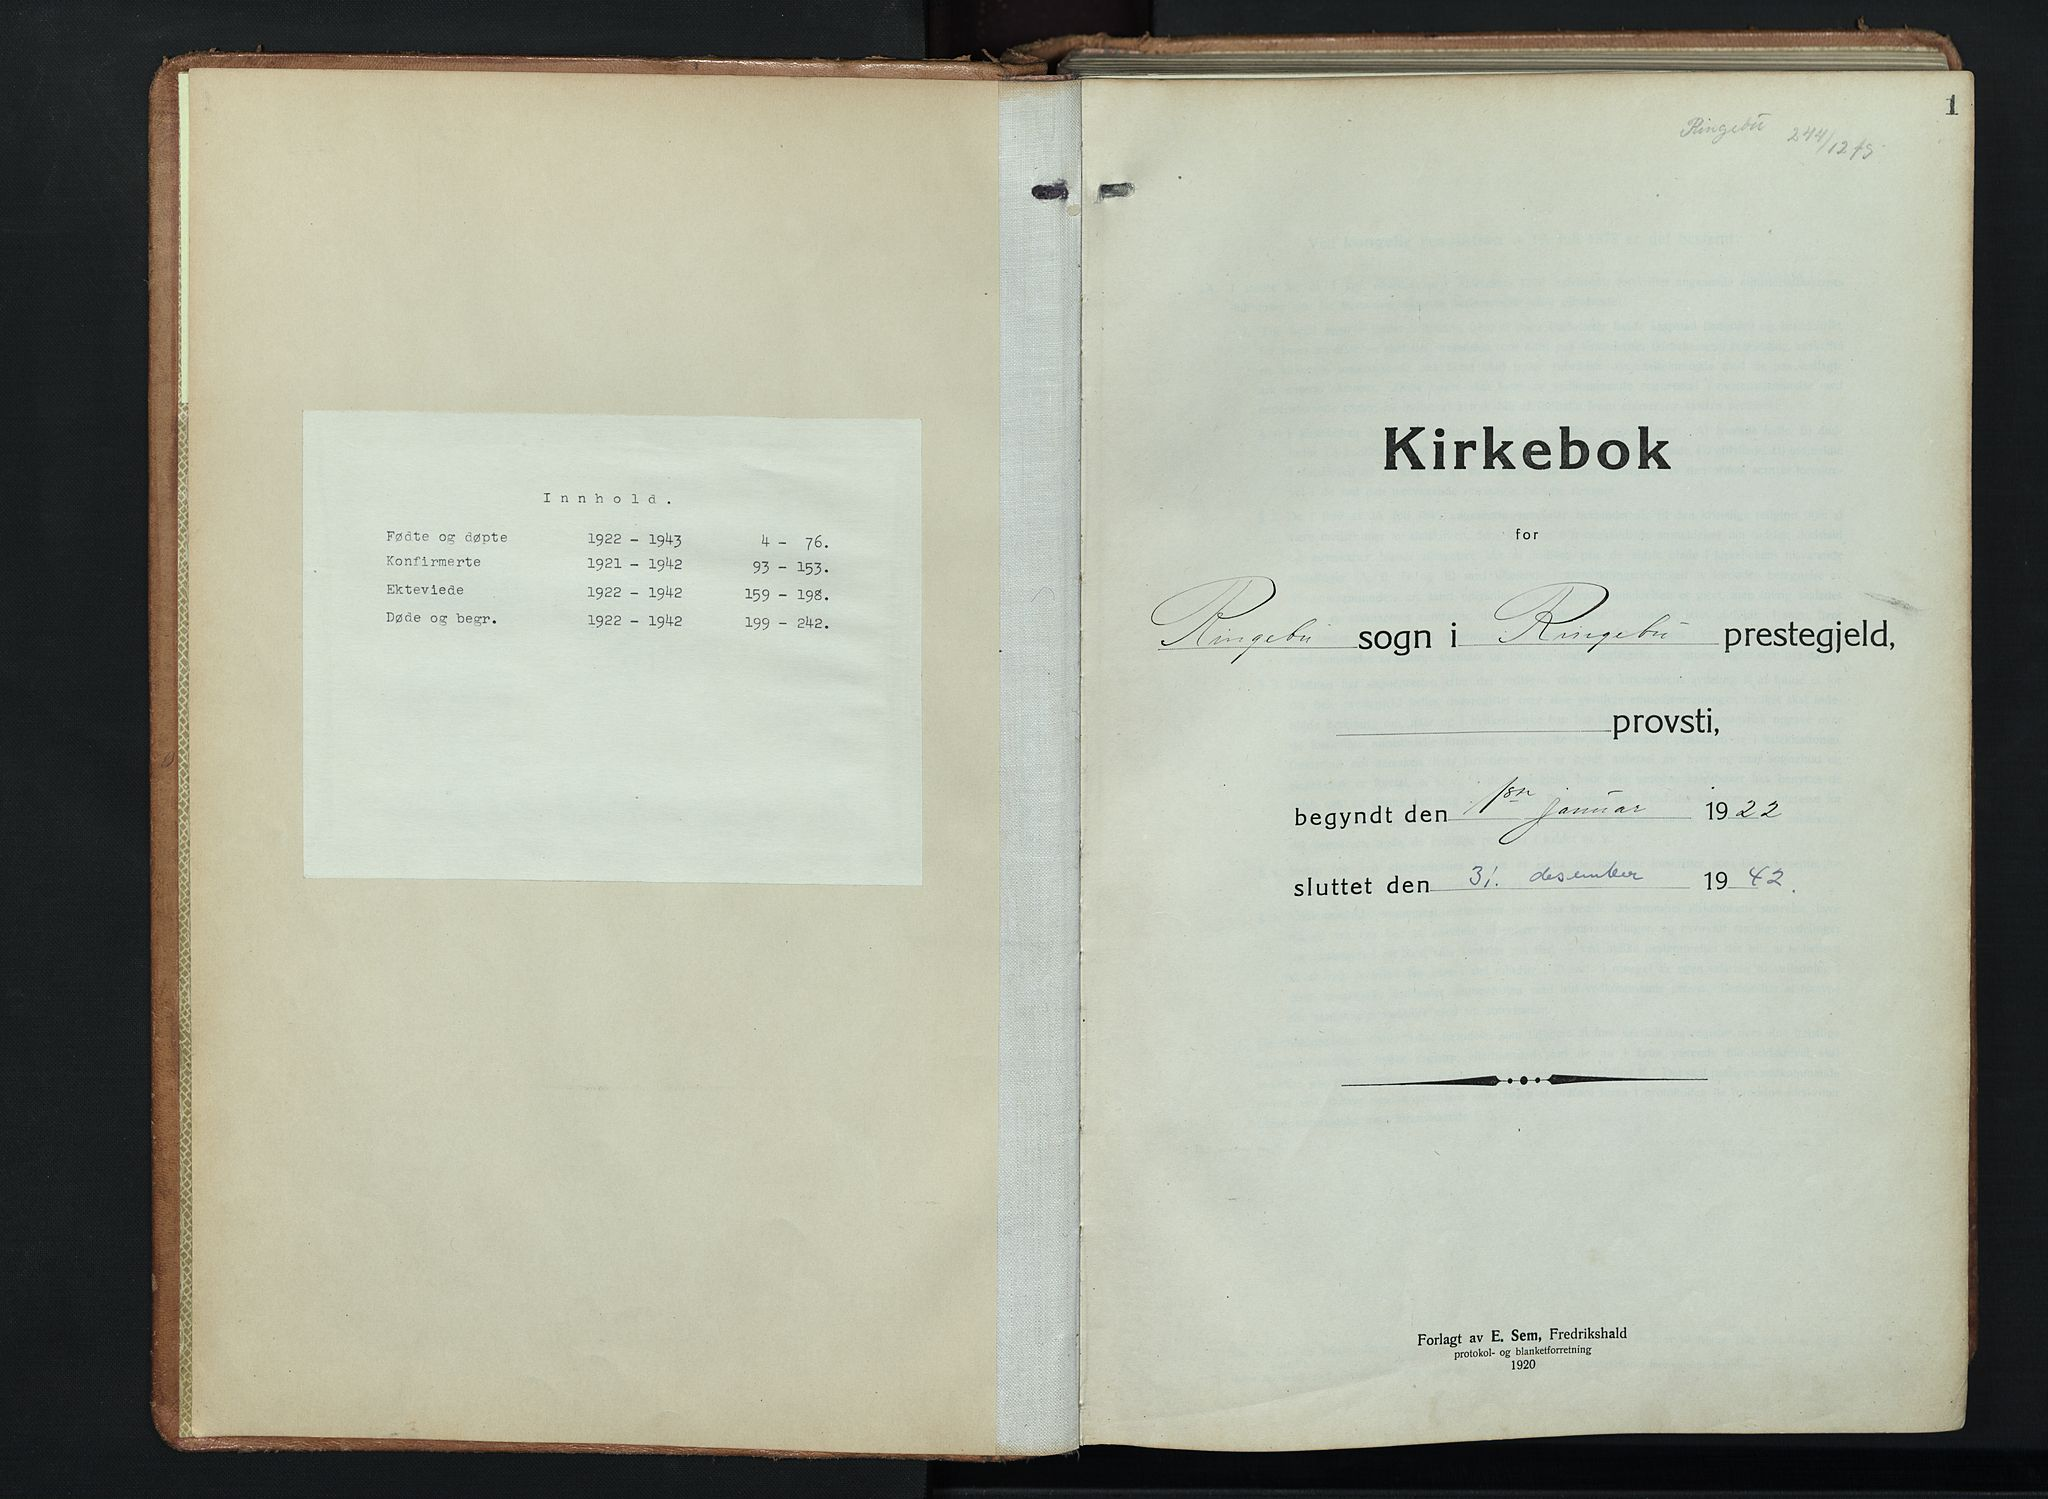 SAH, Ringebu prestekontor, Klokkerbok nr. 11, 1921-1943, s. 1